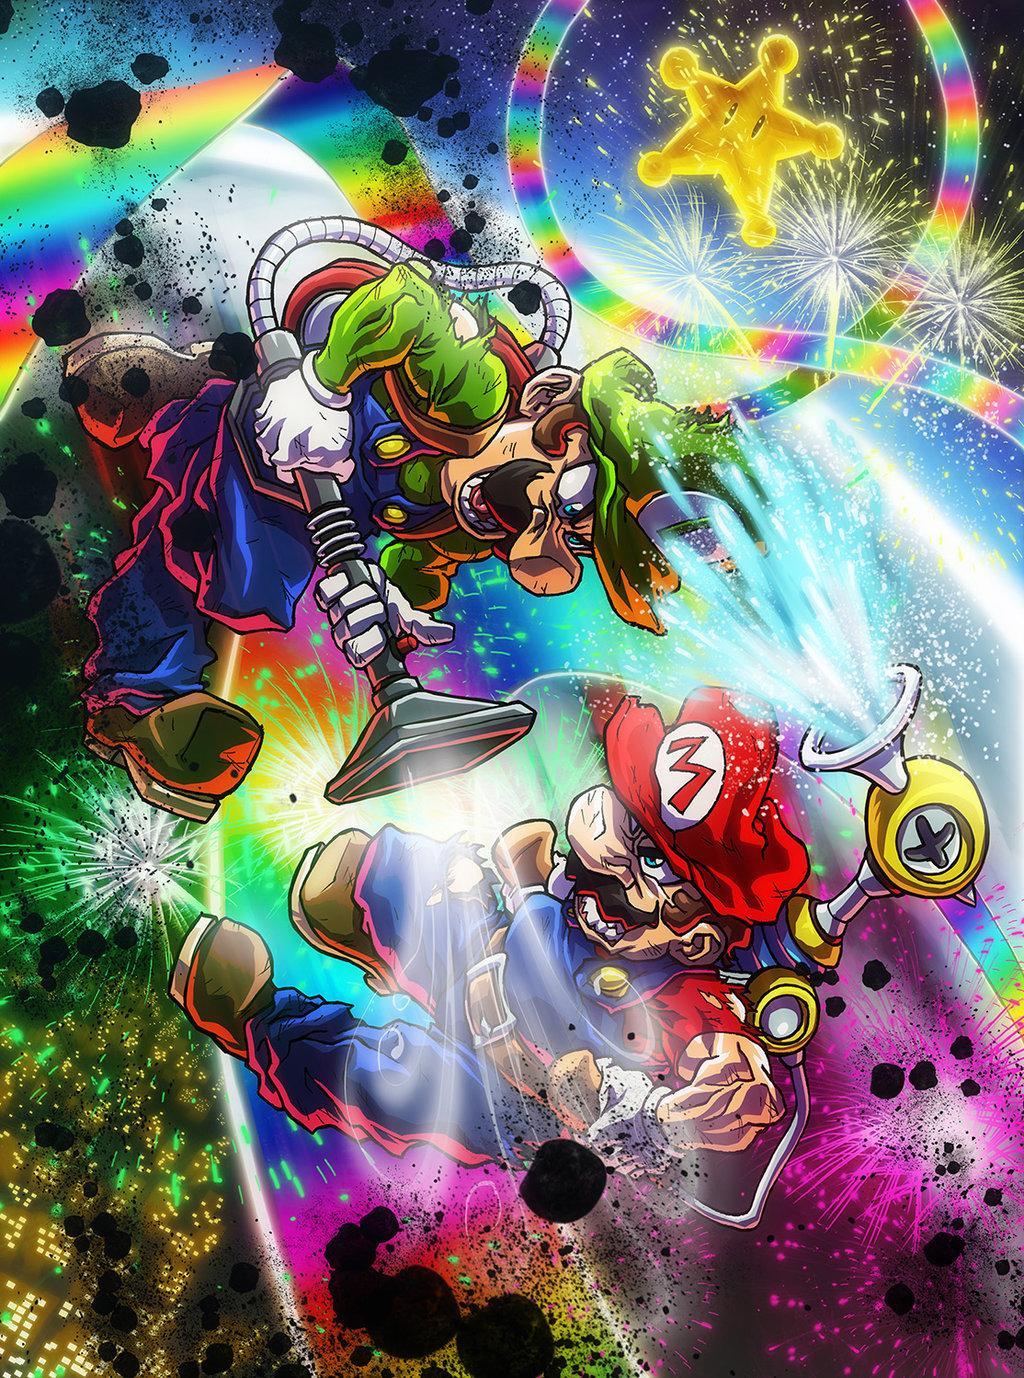 Mario vs. Luigi par Sebastian von Buchwald http://t.co/GwtO47m6ww